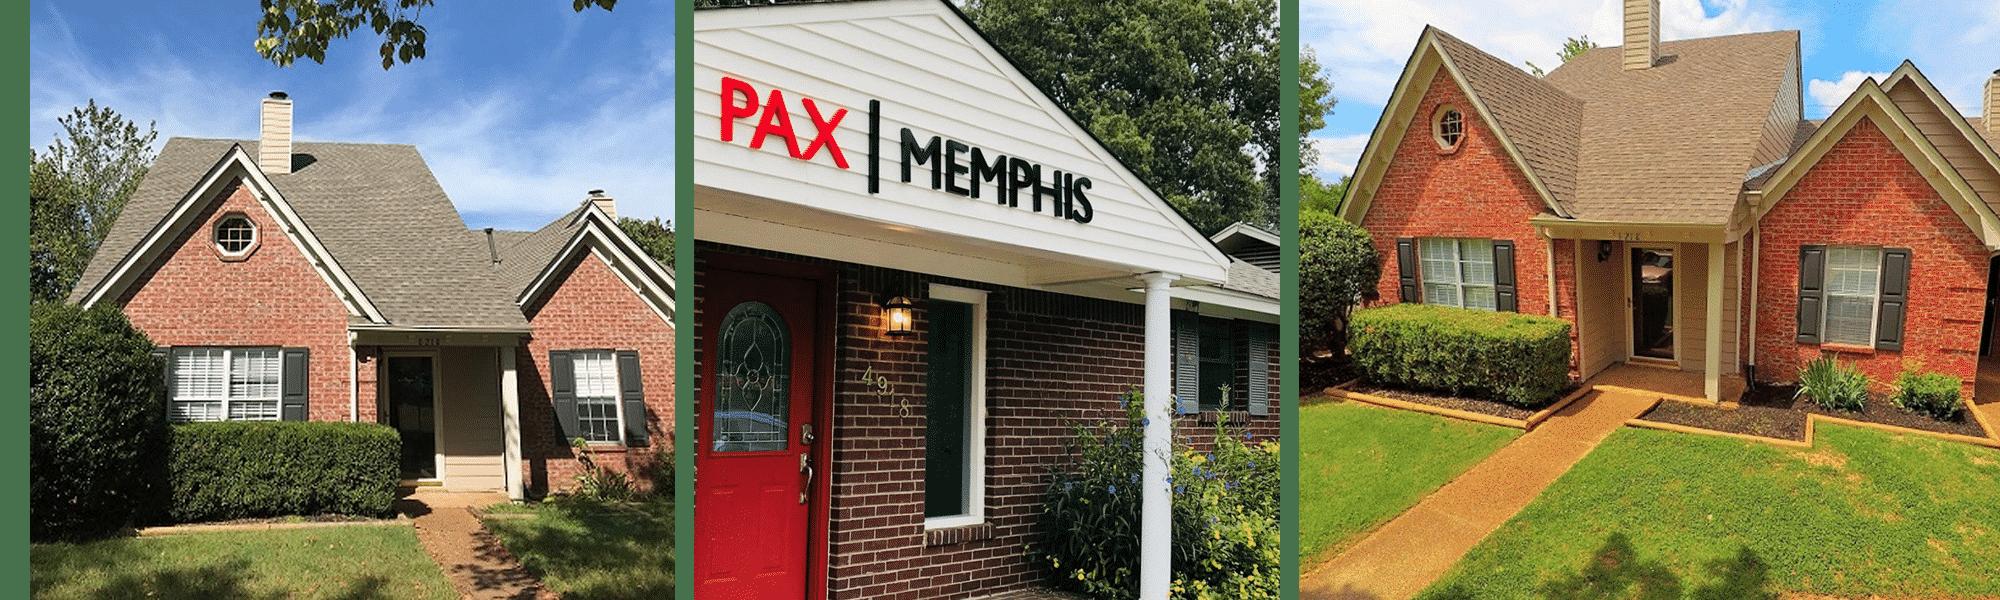 pax memphis recovery center banner